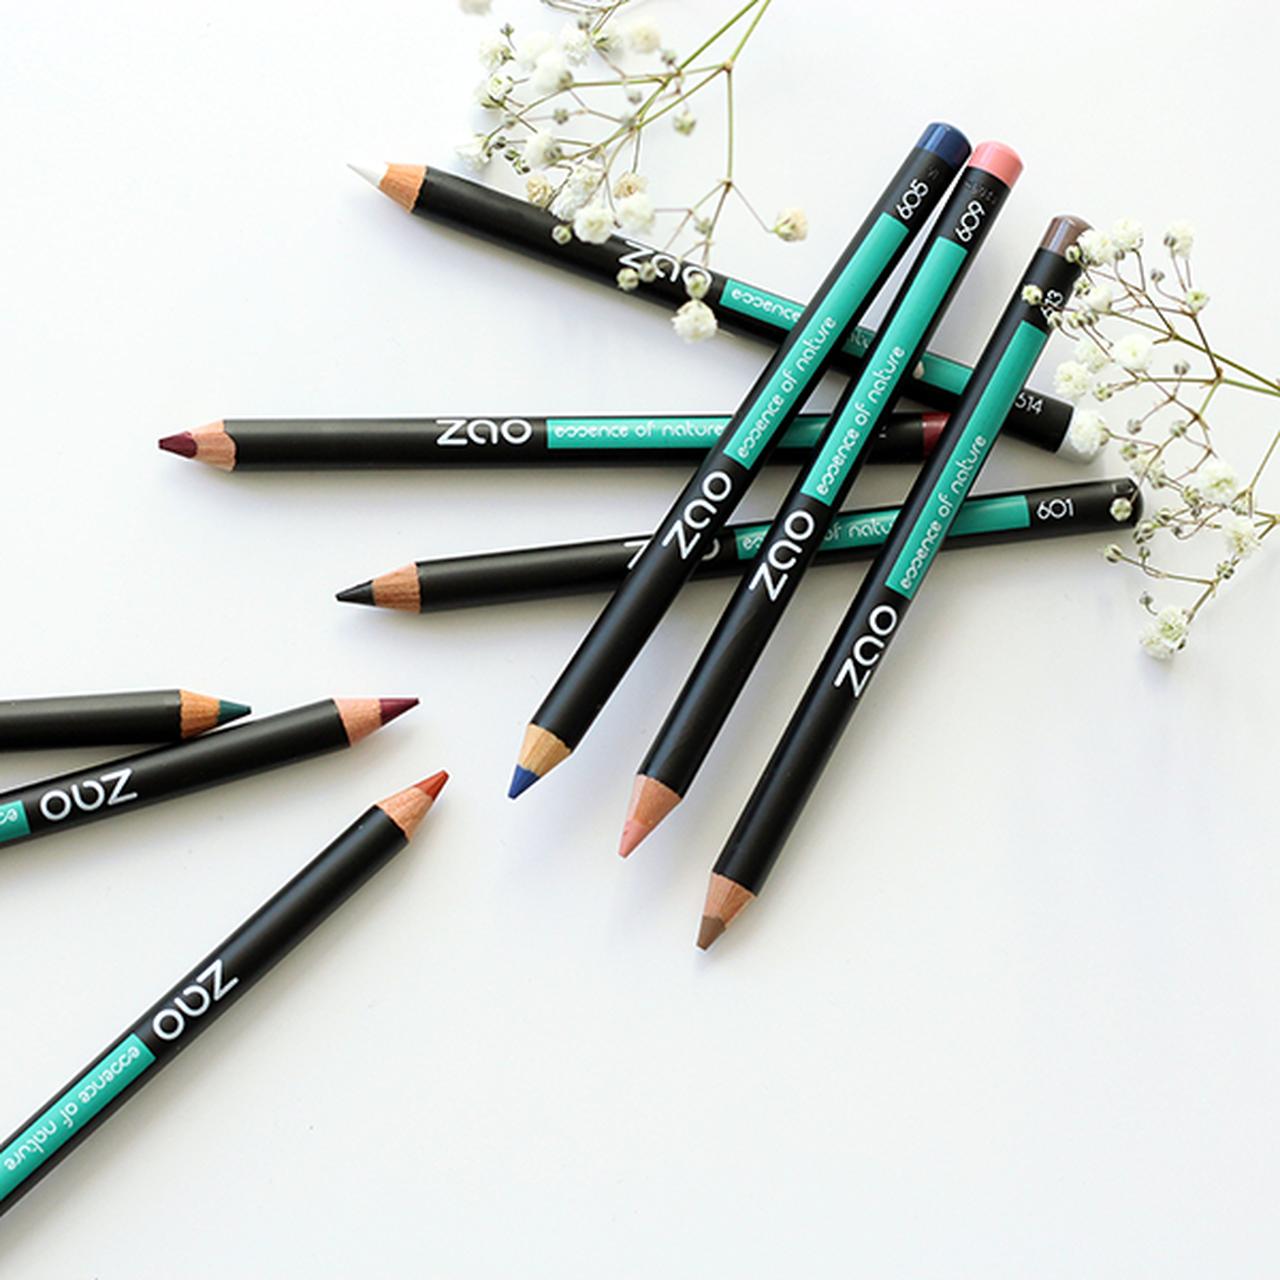 Eyeliner Pencil   Zao Essence of Nature